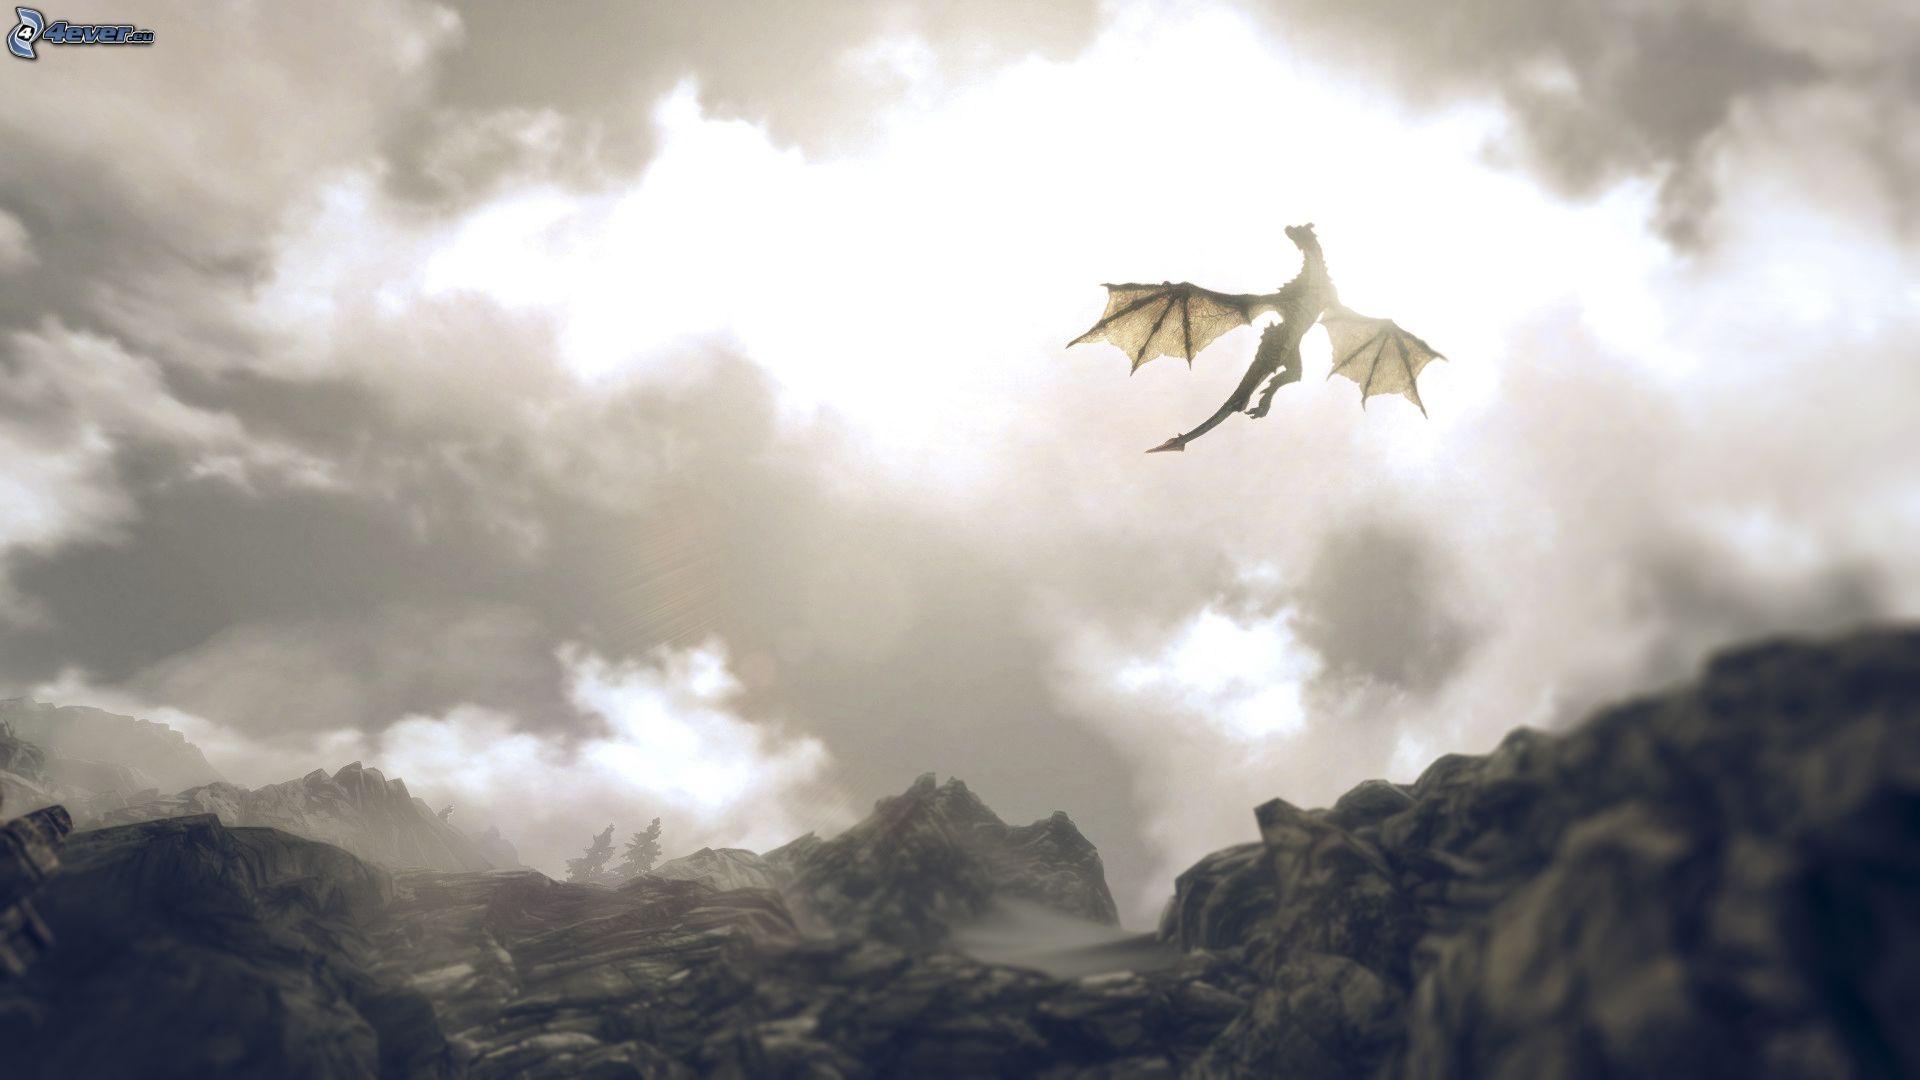 1920x1080 Wallpaper Tron Girl Flying Dragon Clouds